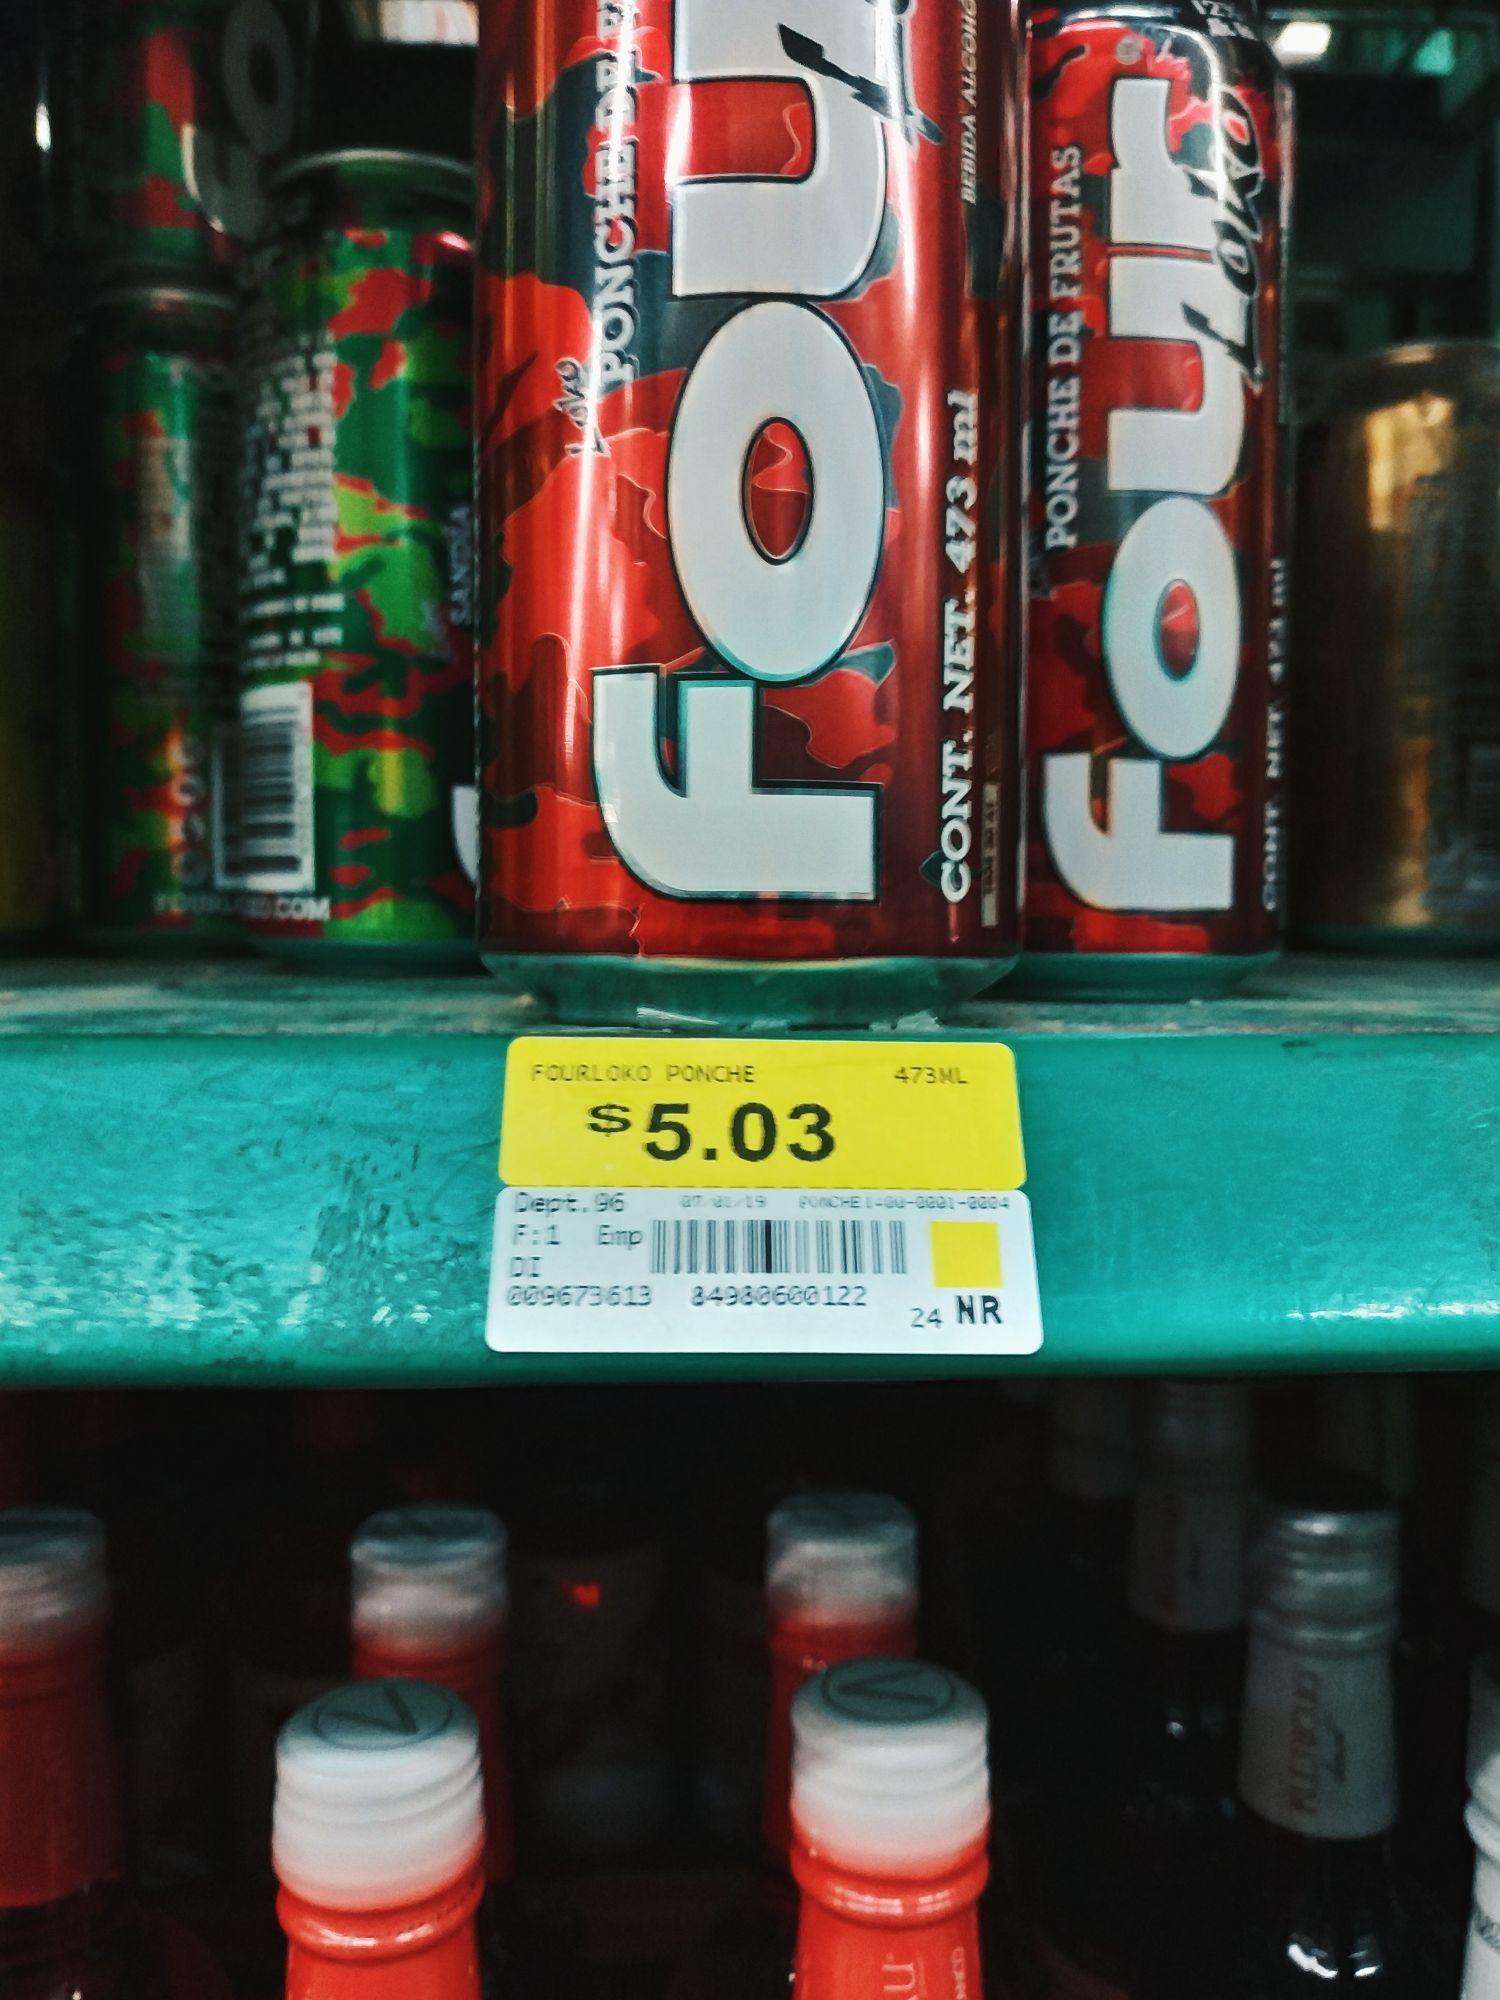 Bodega Aurrera 14 Ote. Puebla: Four Loko a $5.